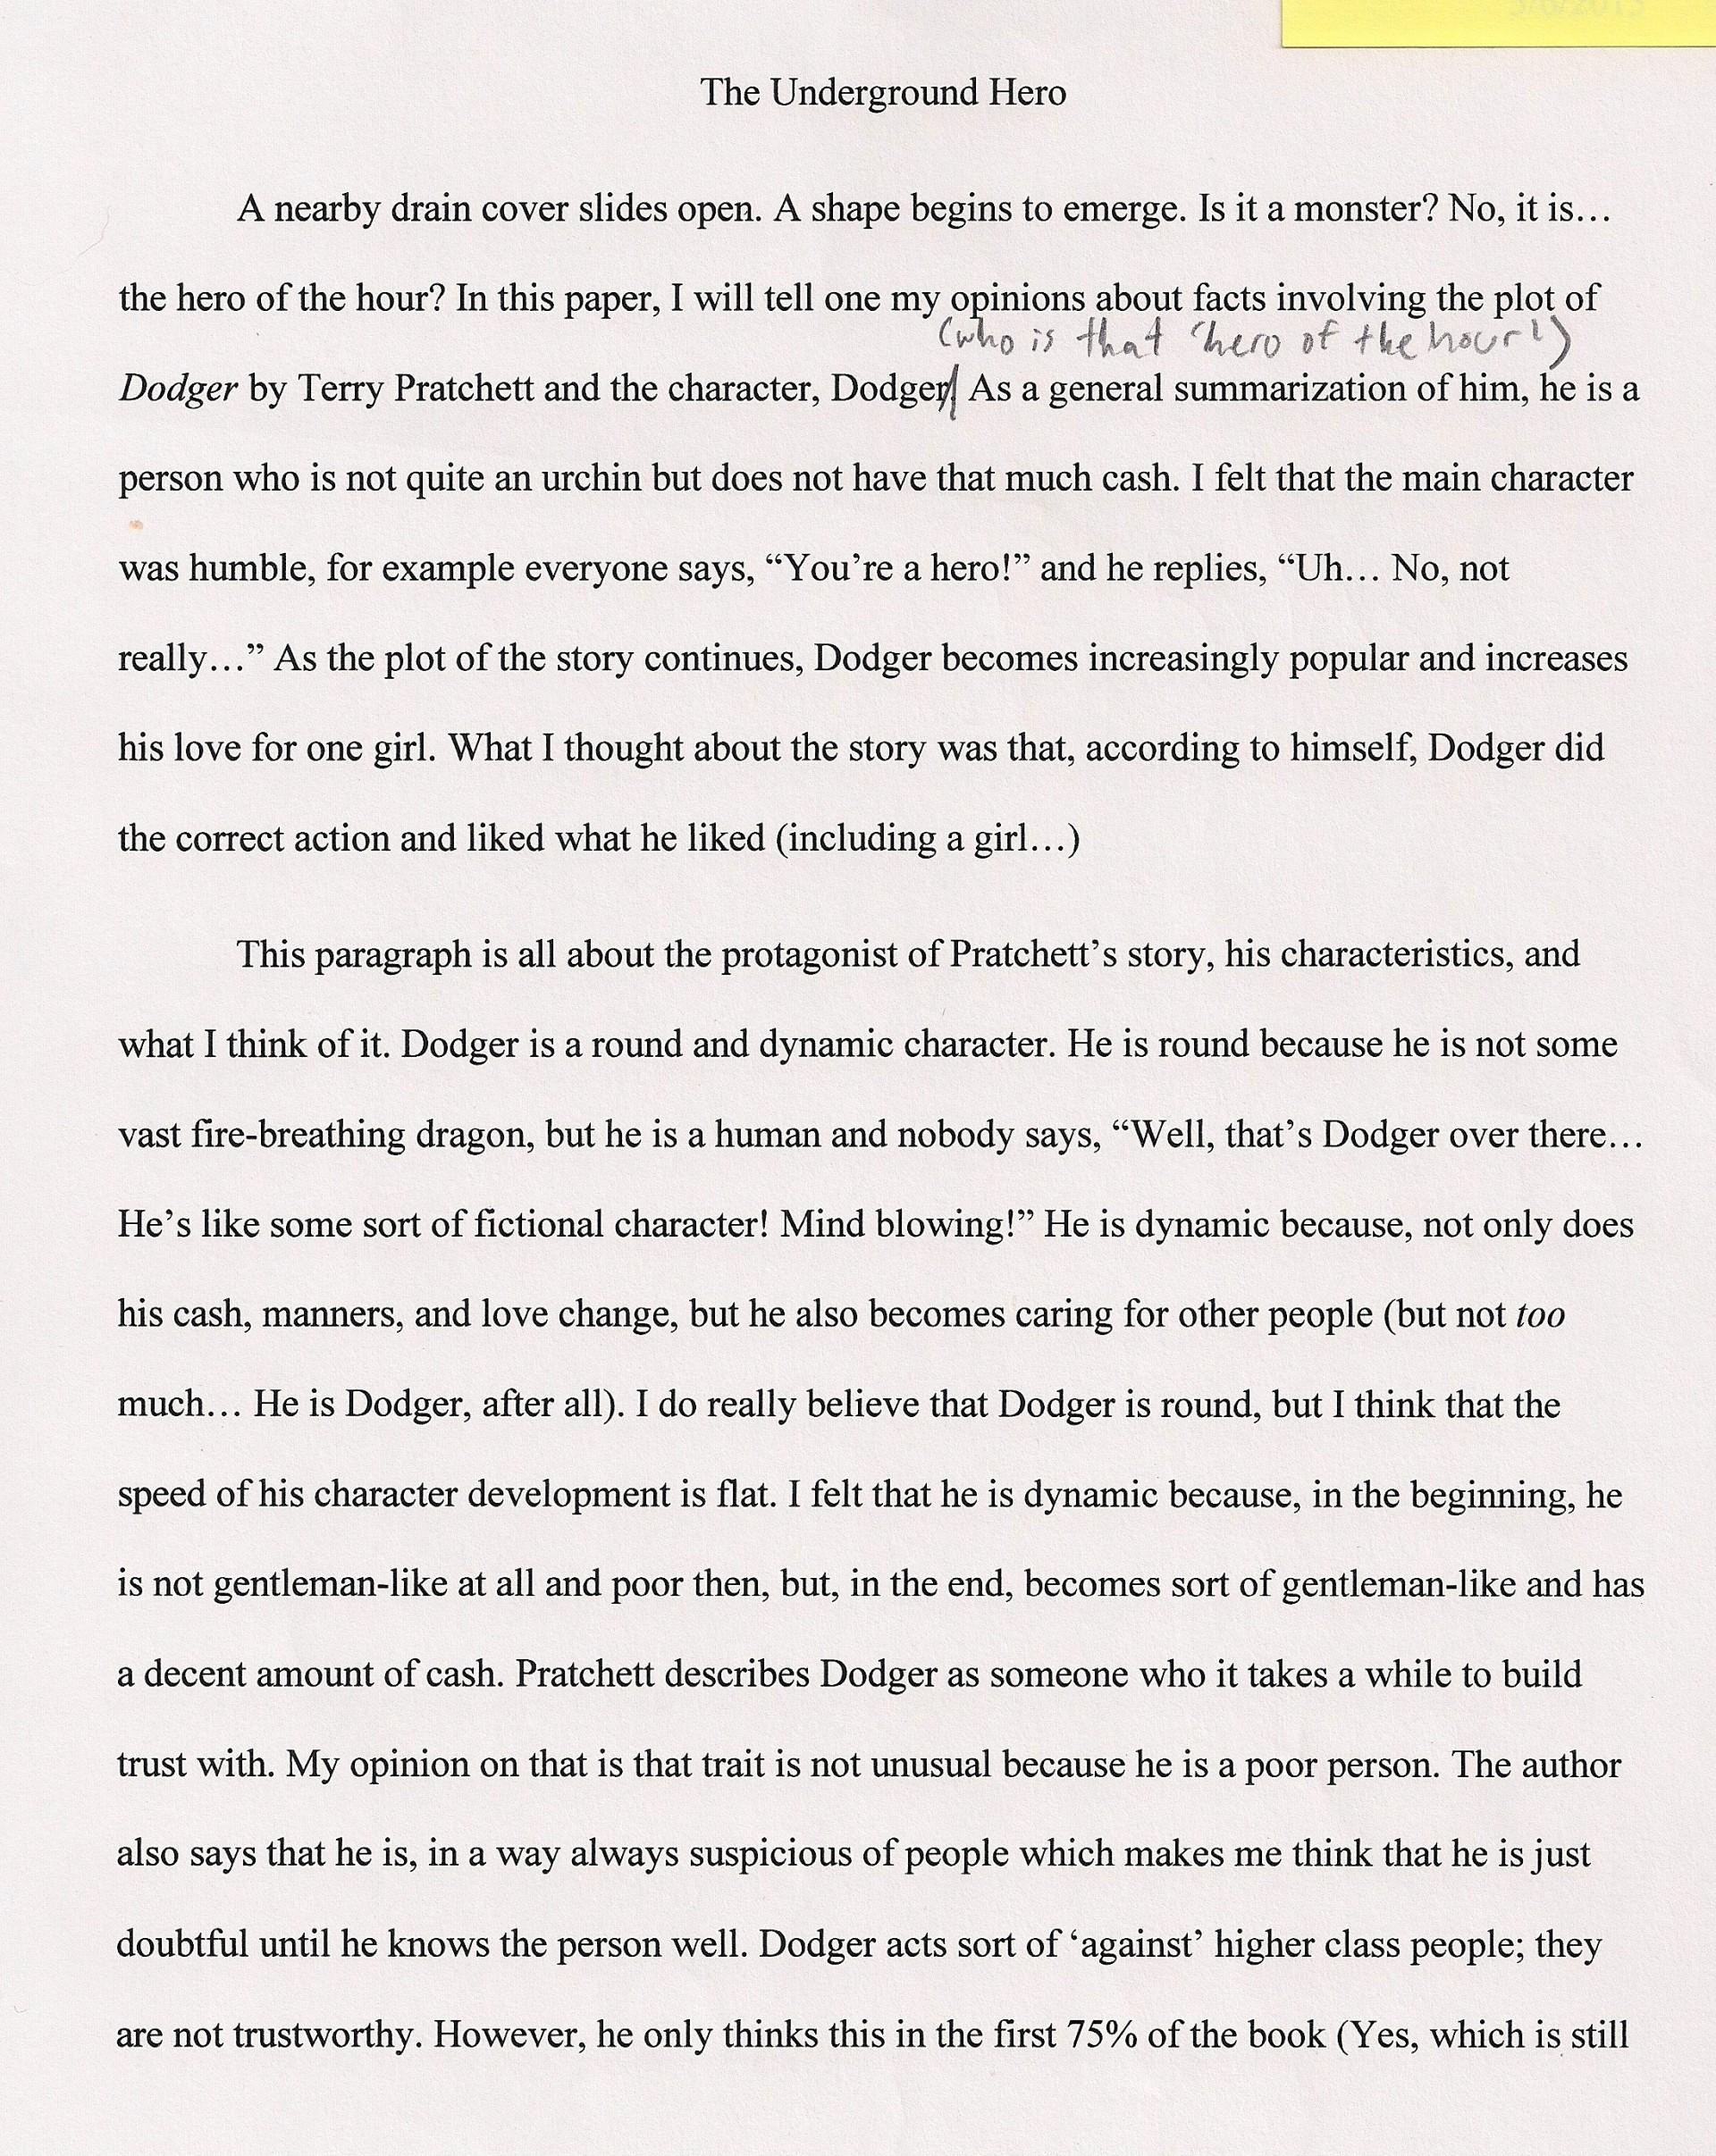 001 Hero Essays The Underground Staggering Essay Examples My Michigan Superhero 1920